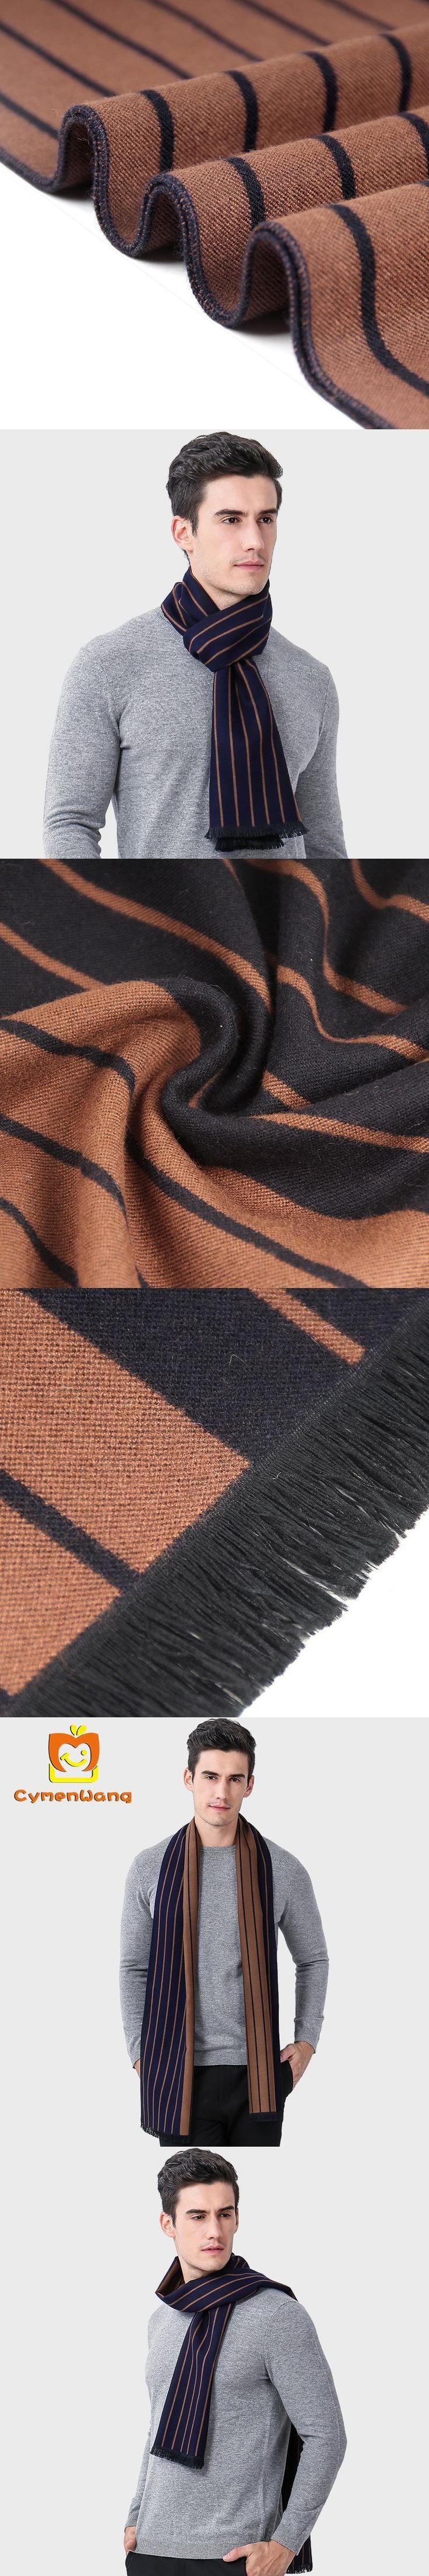 Cymenwang New Winter designer scarf men cotton Scarves female & male brand shawl wrap knit cashmere bufandas scarf with tassels